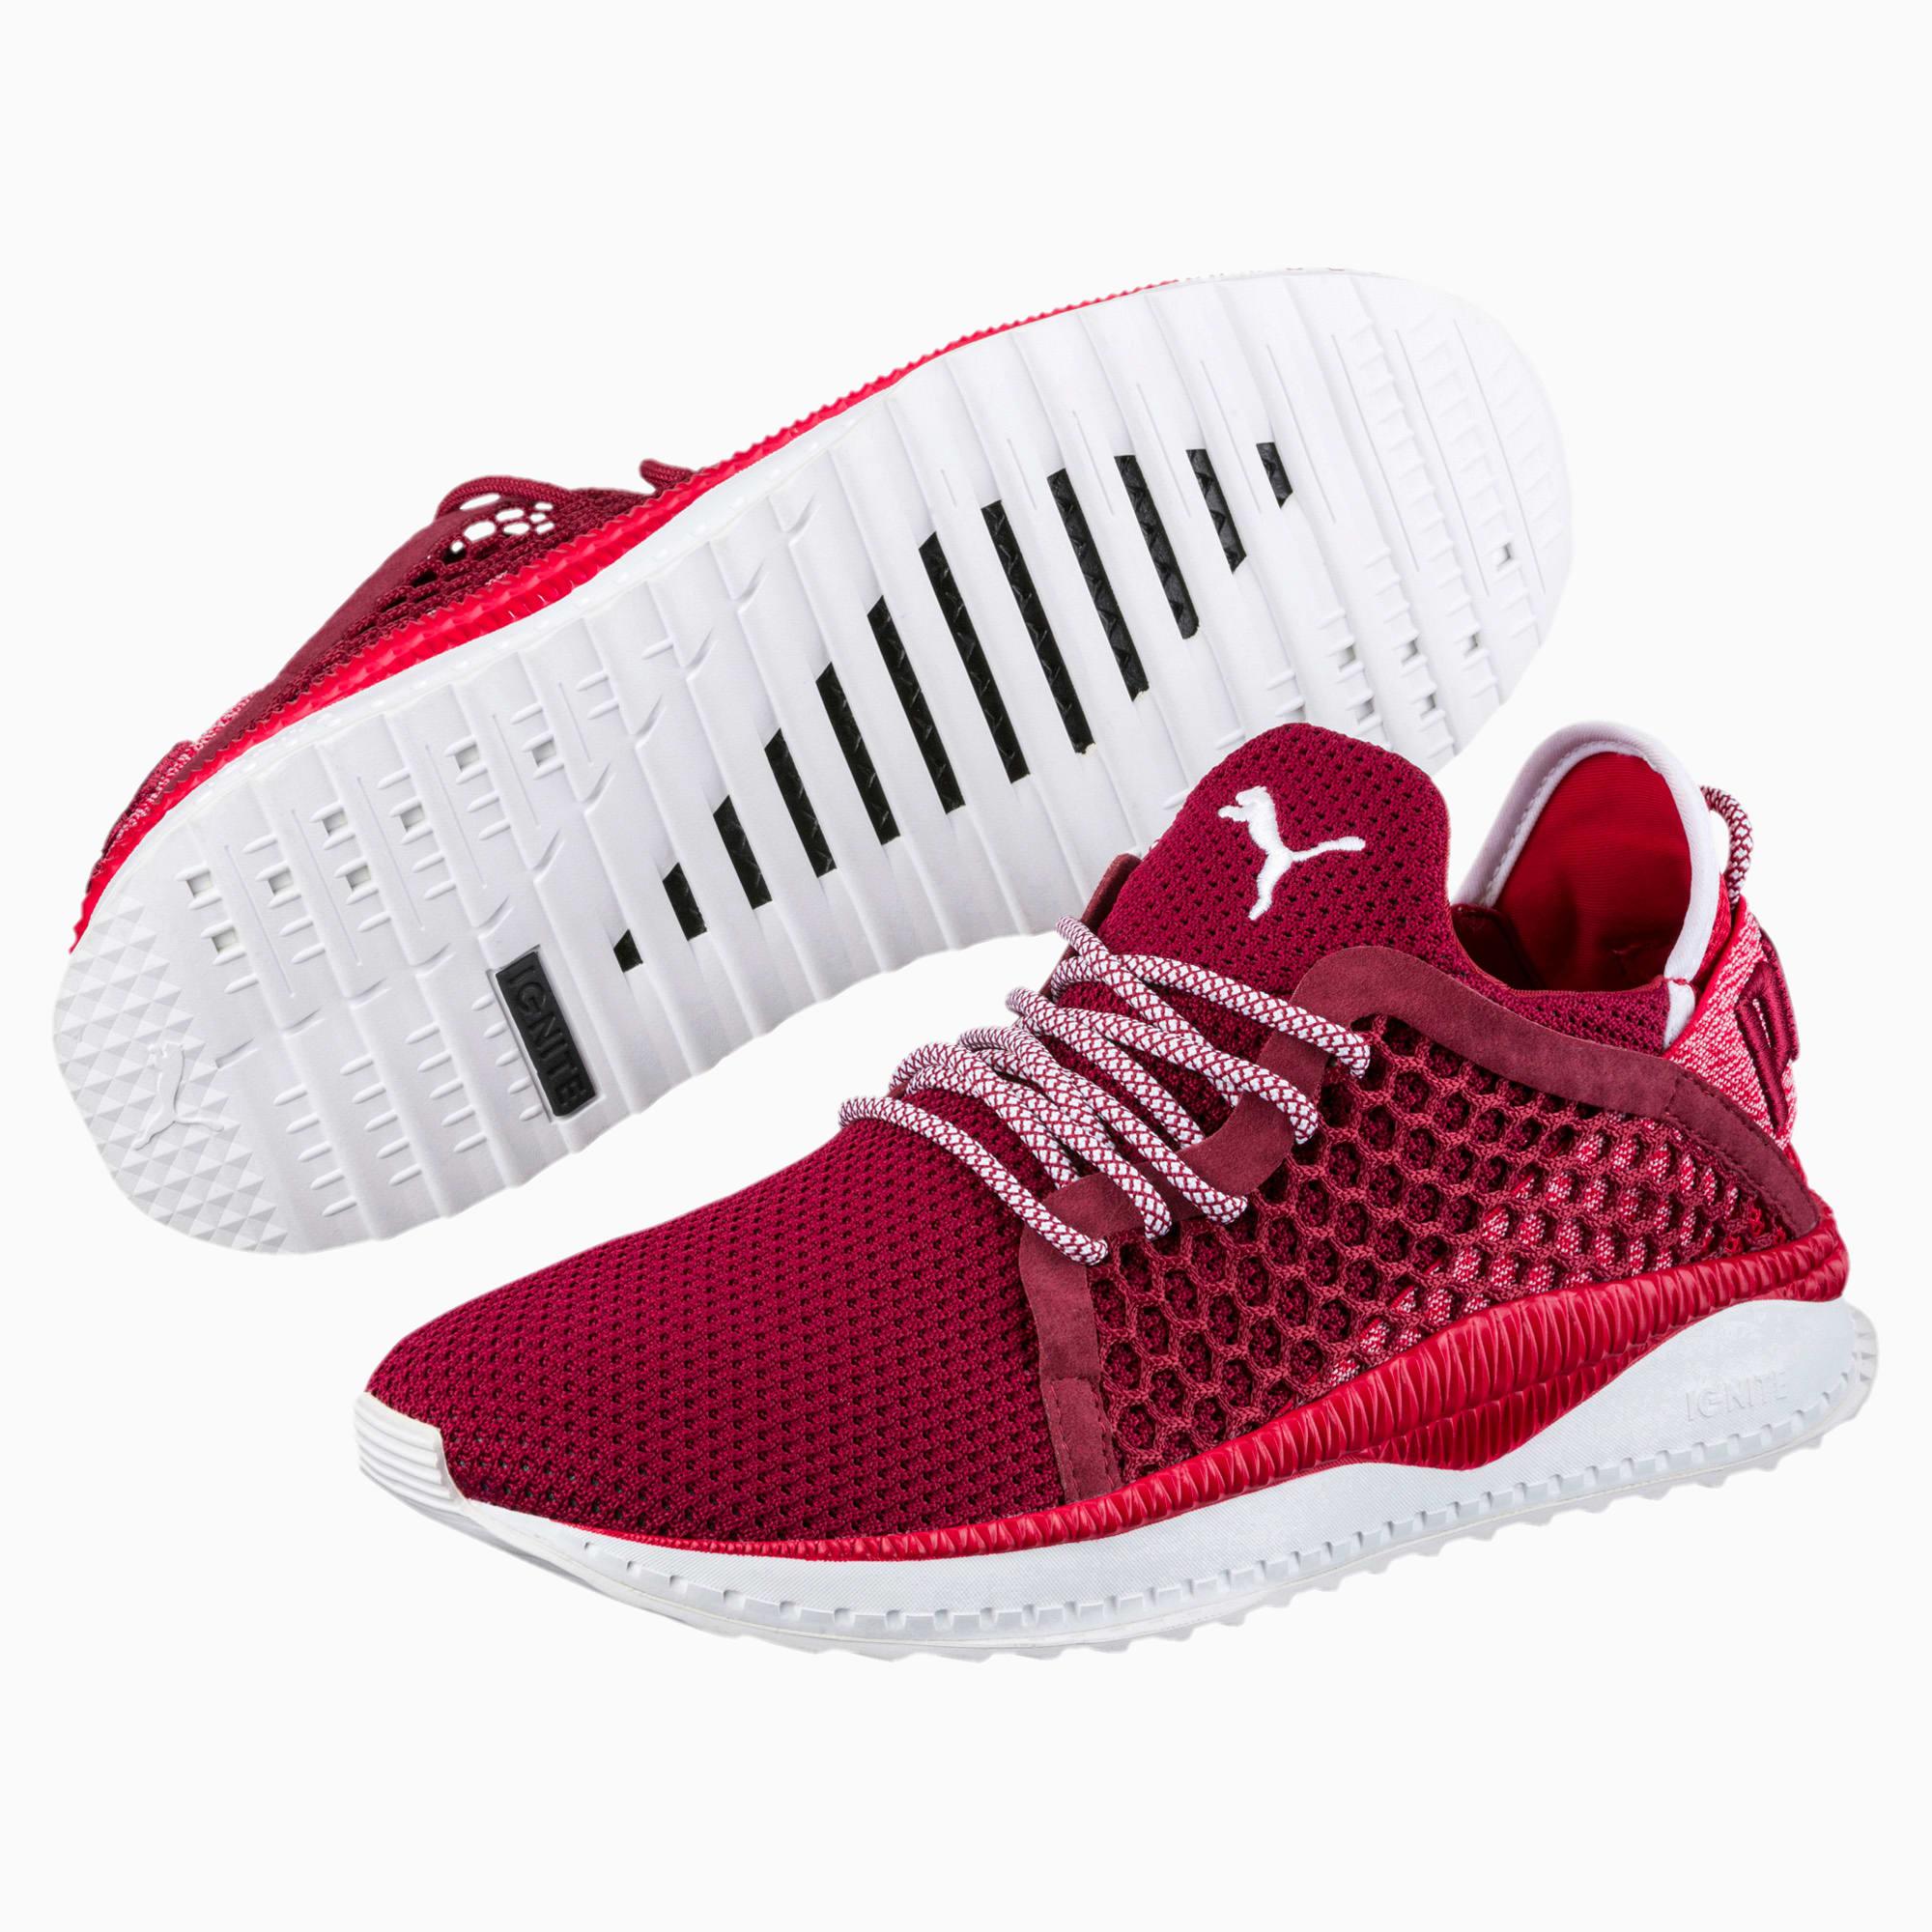 TSUGI NETFIT Men's Training Shoes